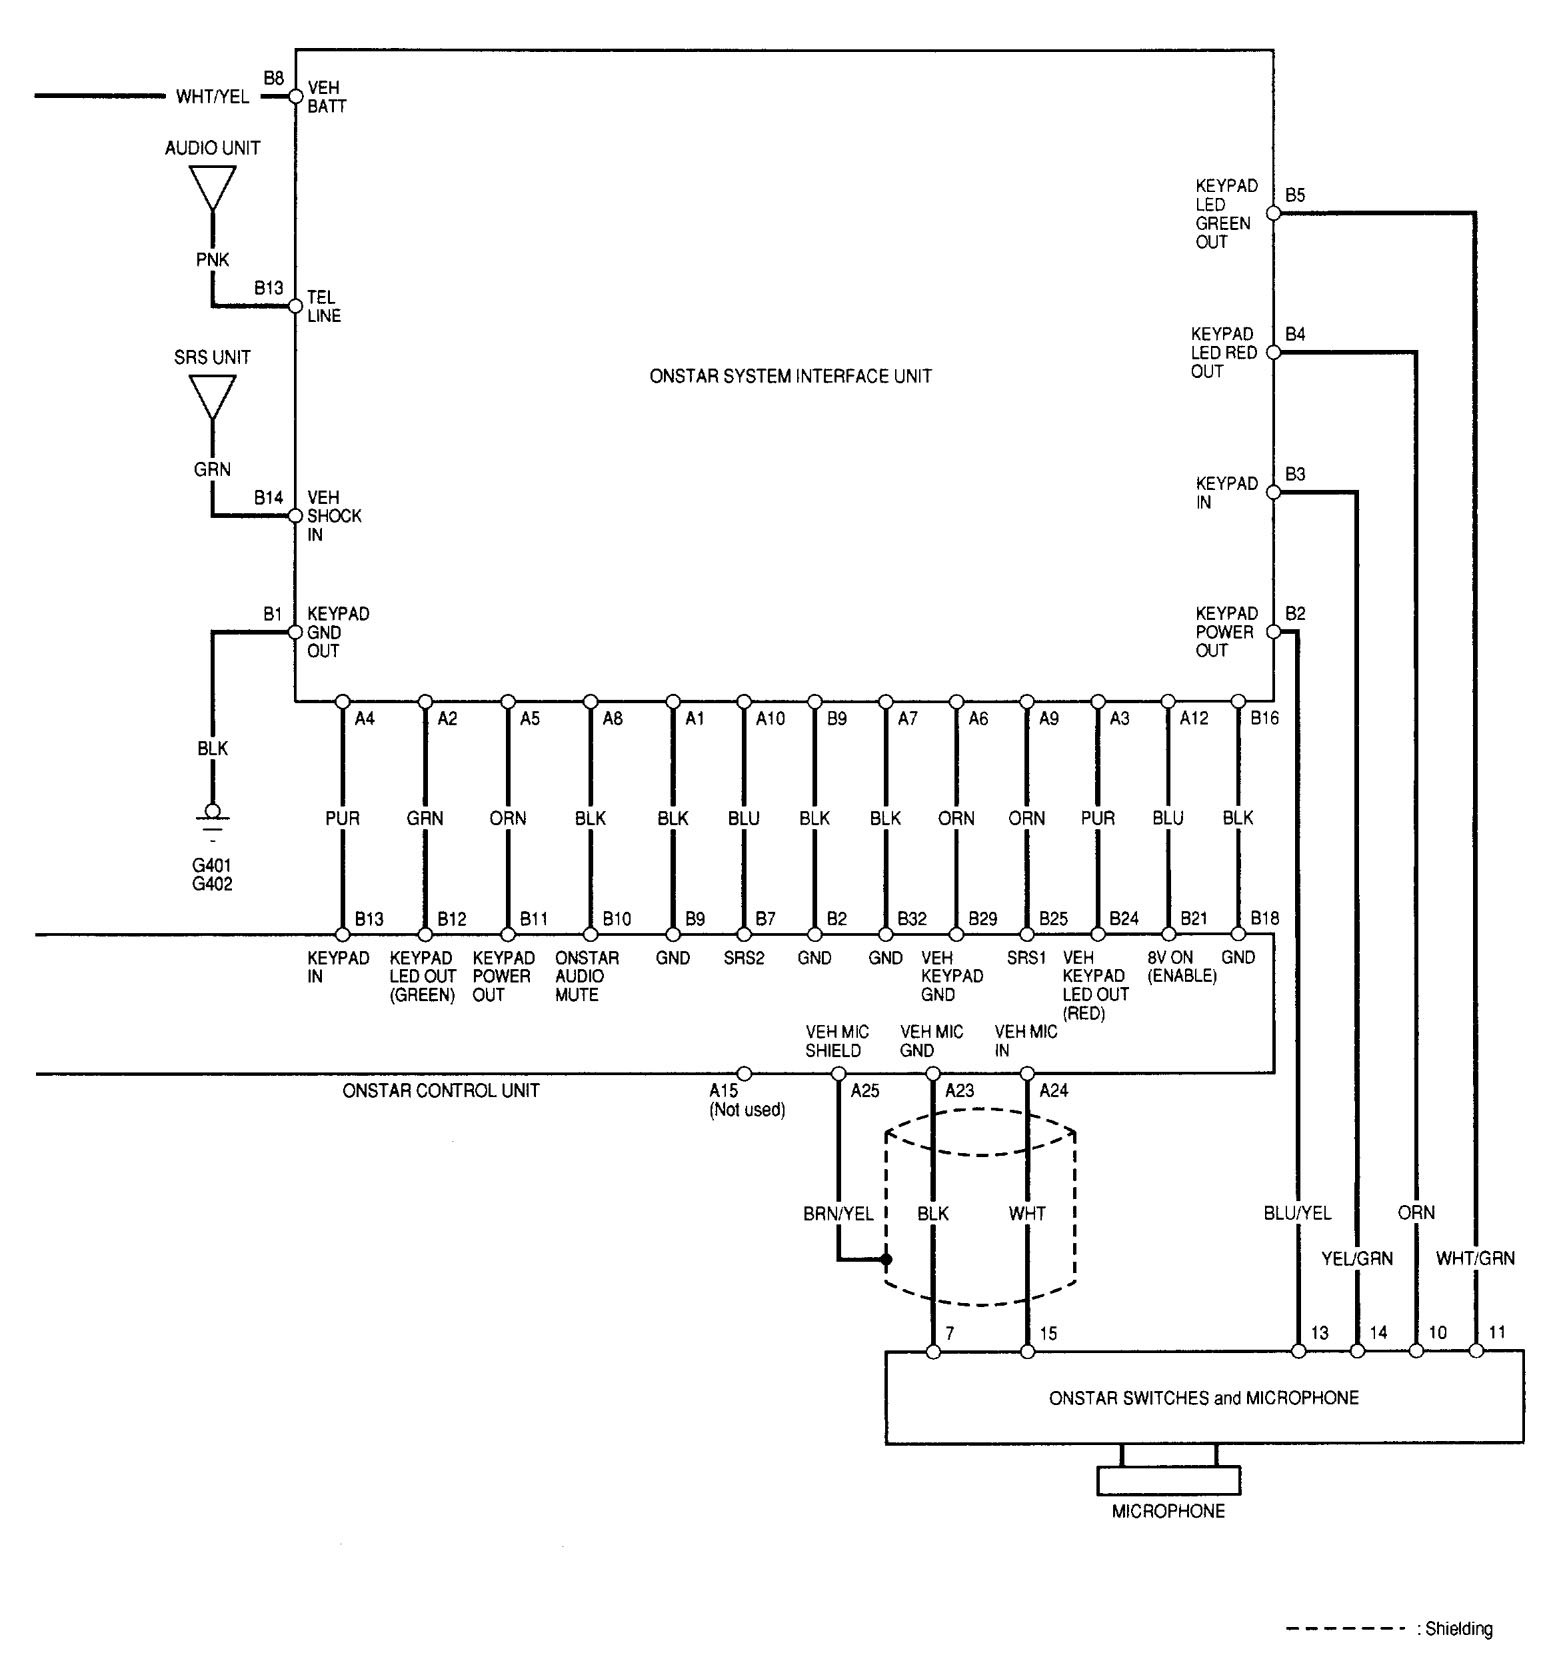 Acura Rl (2002) Wiring Diagrams Onstar System Carknowledge 2002 Acura 3.5 RL  Wiring Diagram For 2002 Acura Rl